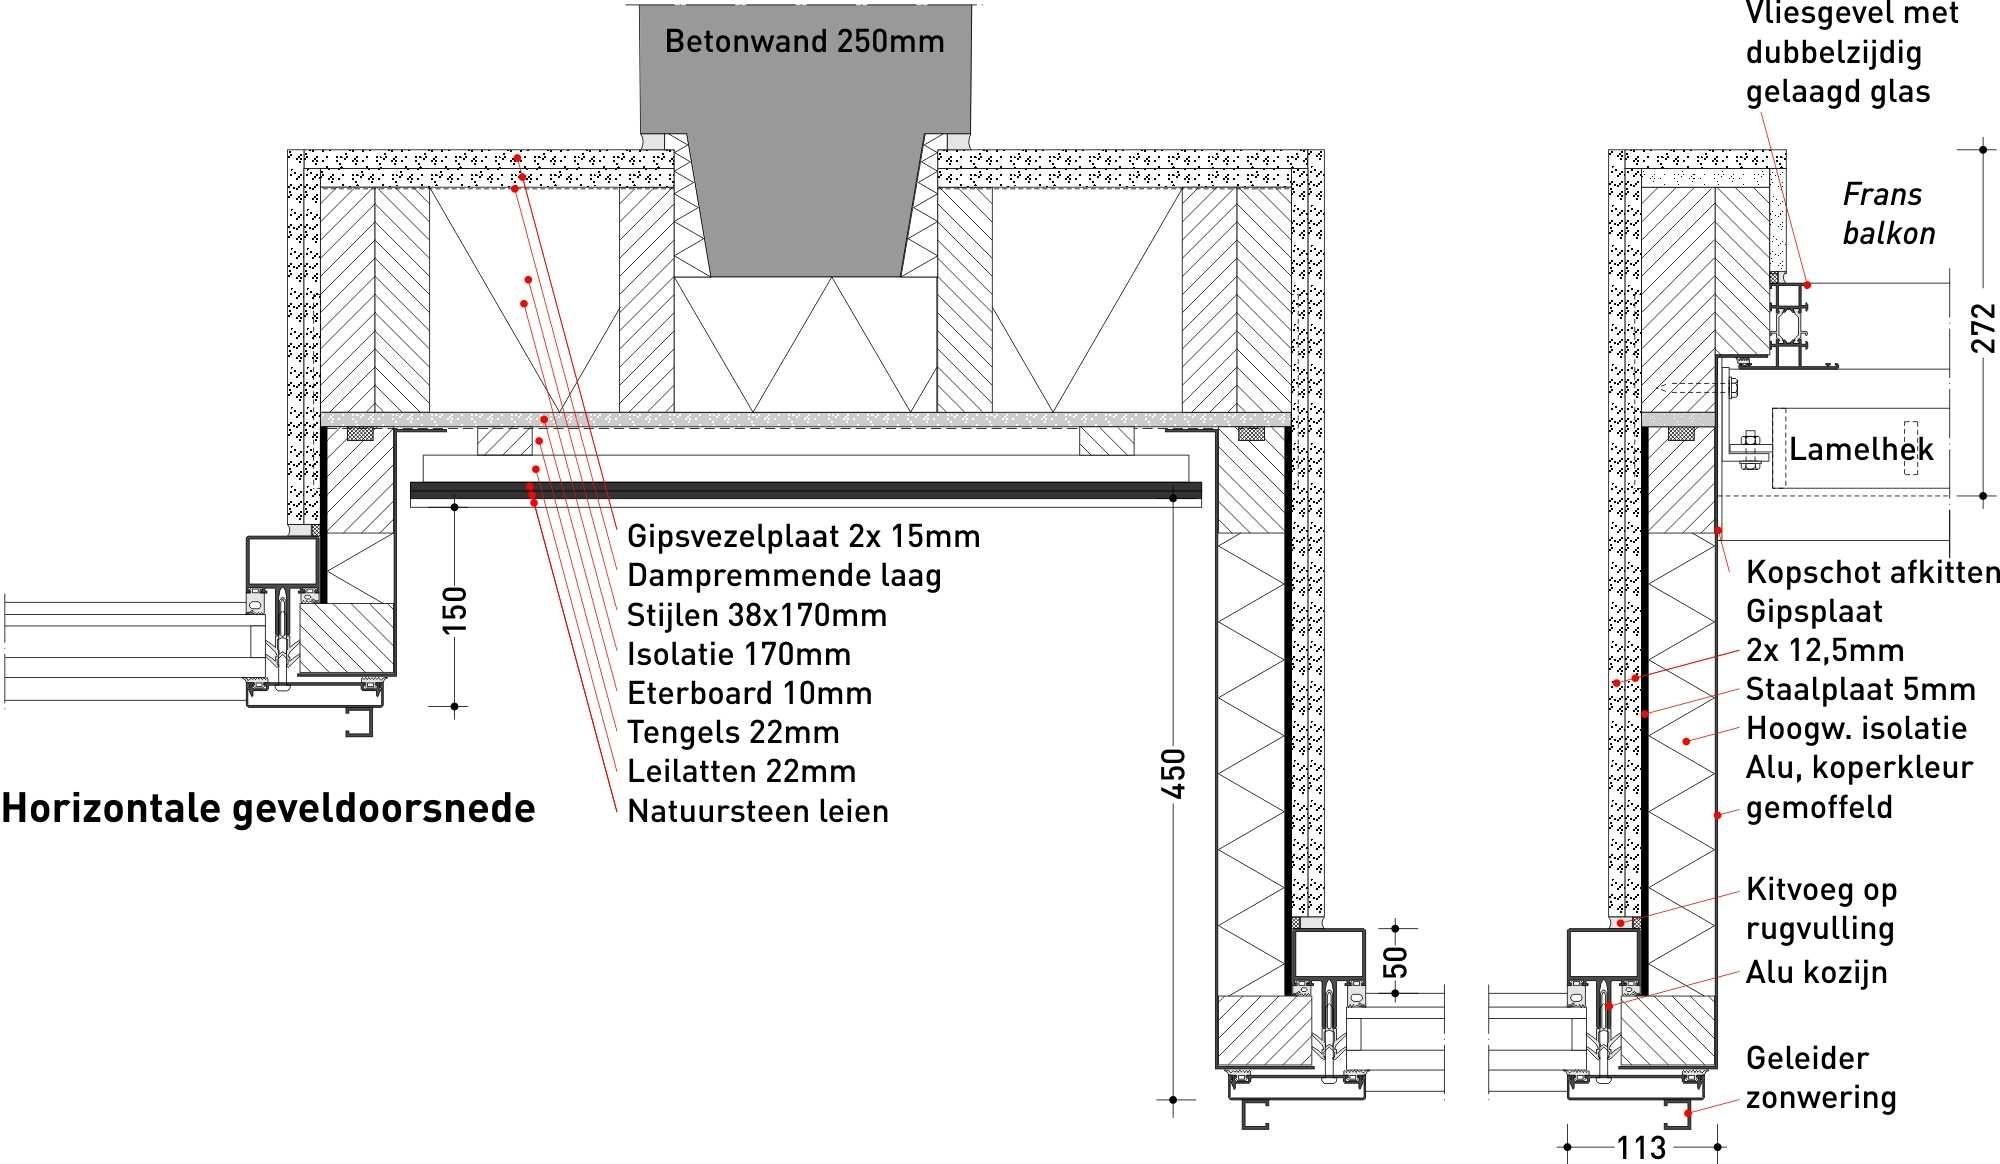 Aluminium erkers in vijf standen - Bouwwereld.nl (www.groosman.com / @GroosmanNL)